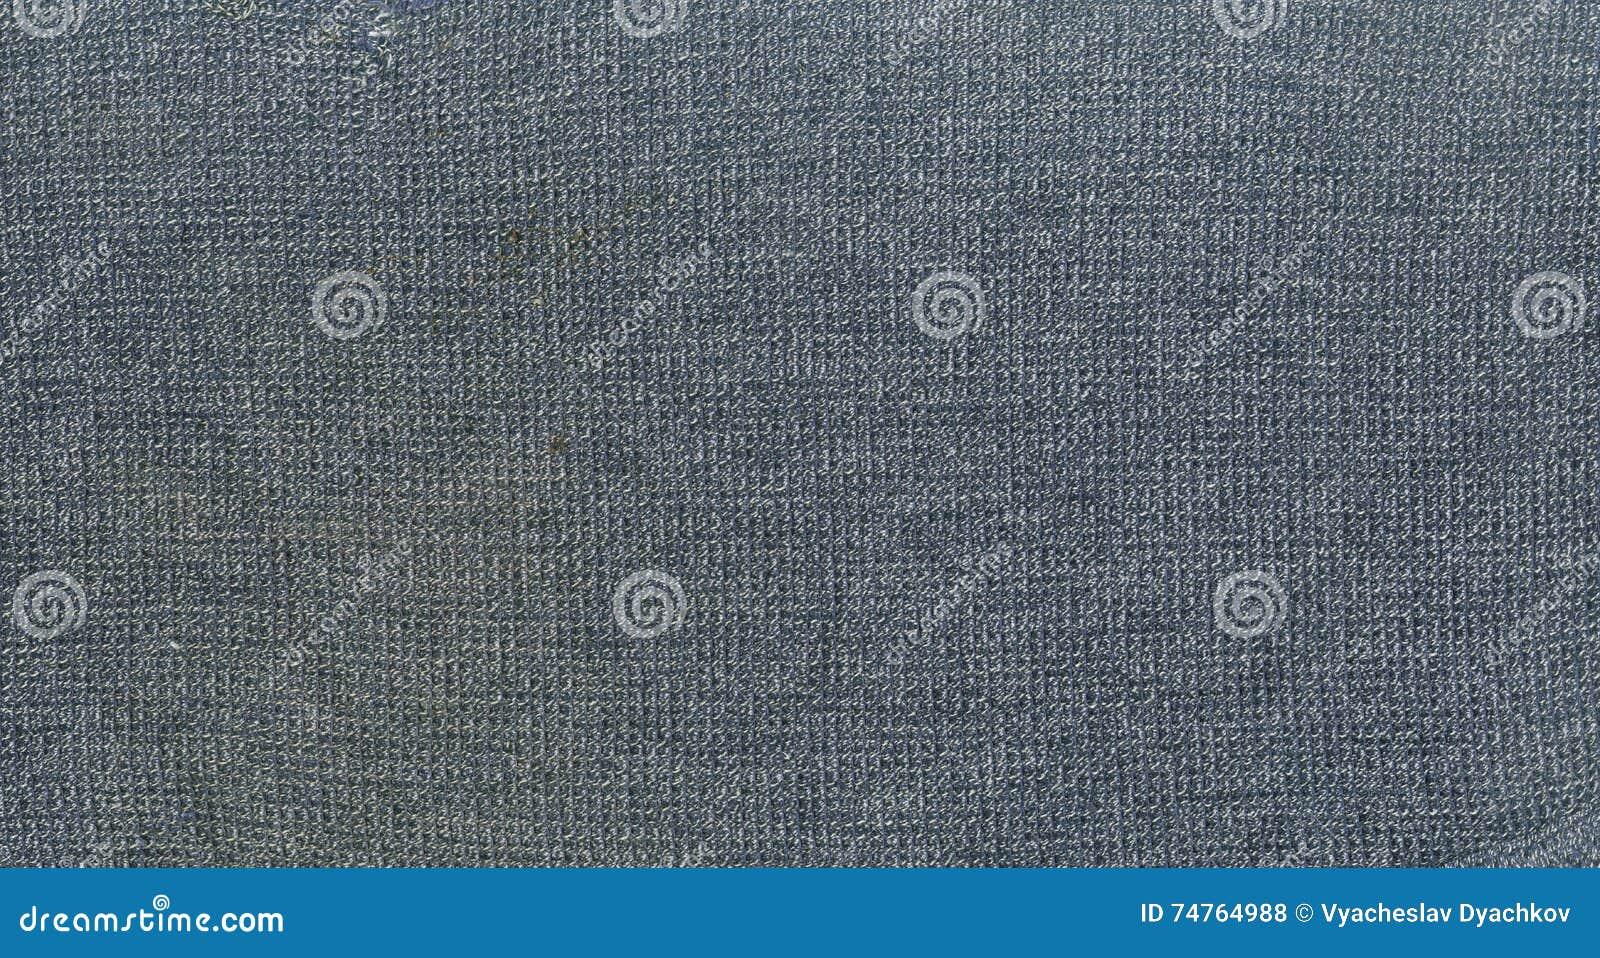 Texture - oblique rectangular mesh against insects, horseflies, flies, mosquitoes.